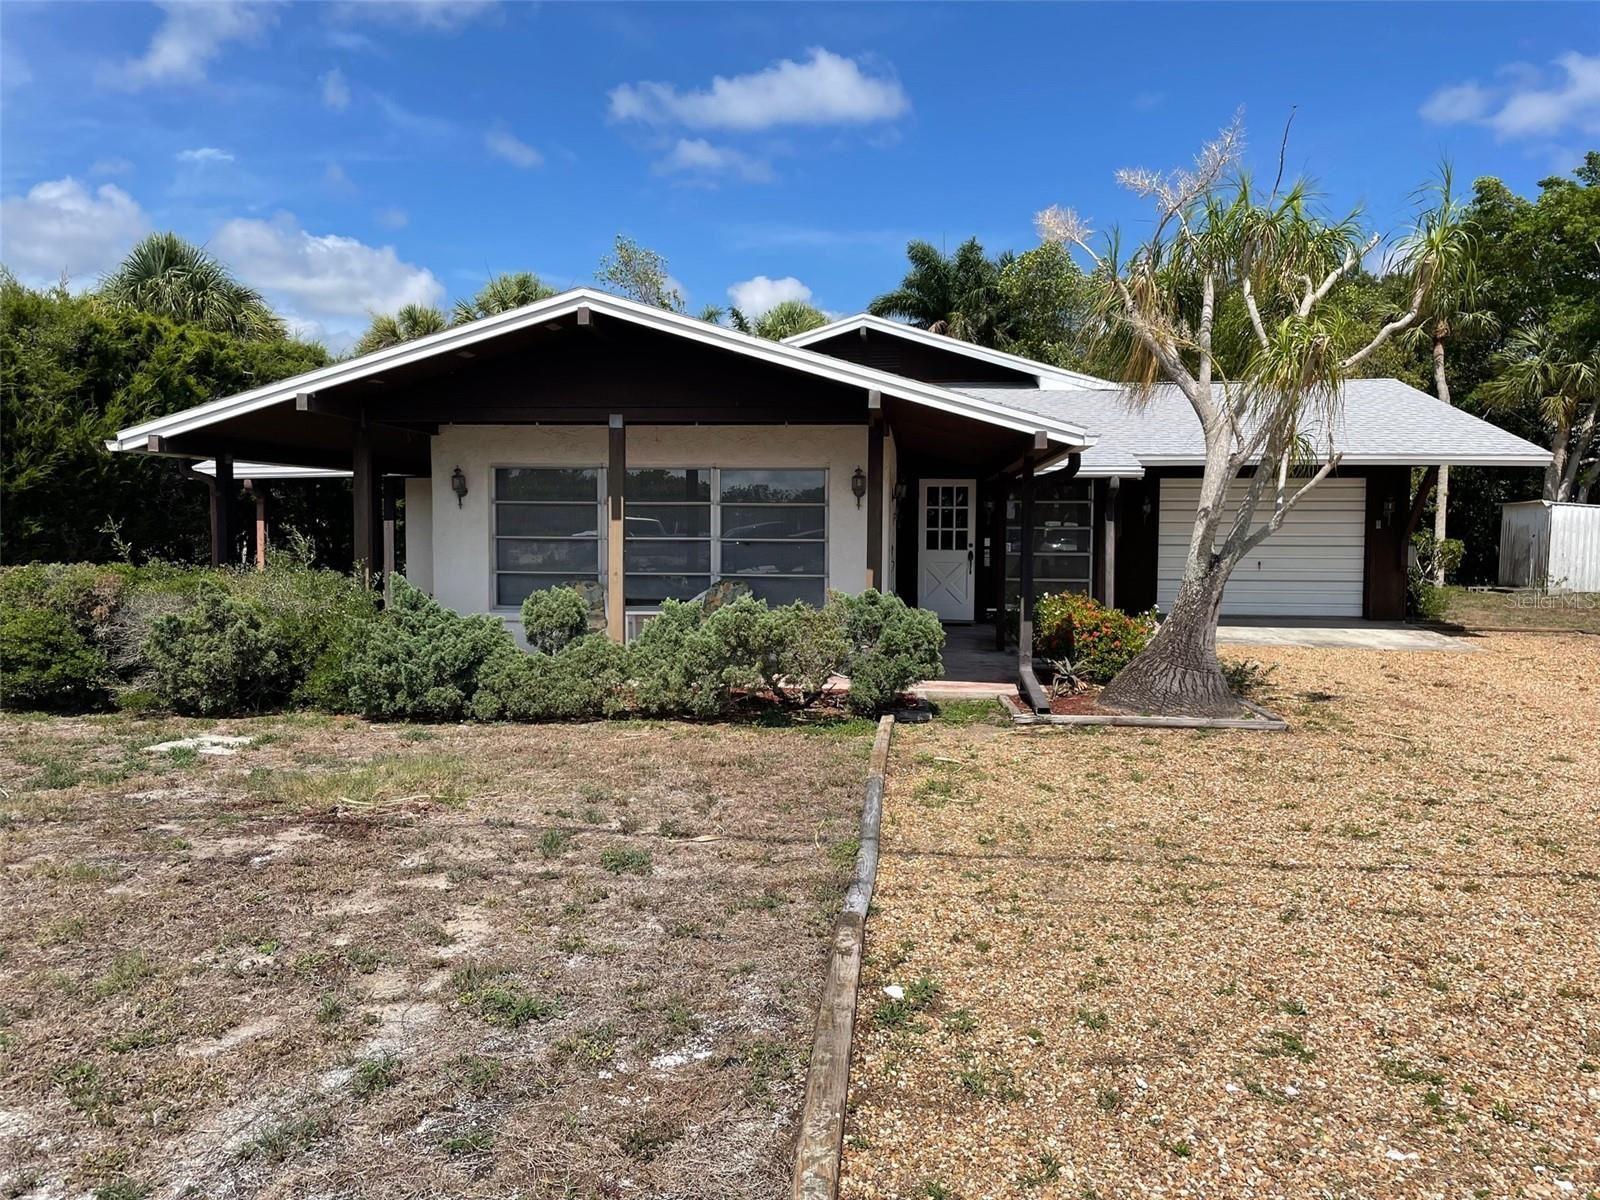 Photo of 231 WINSON AVENUE, ENGLEWOOD, FL 34223 (MLS # D6119431)